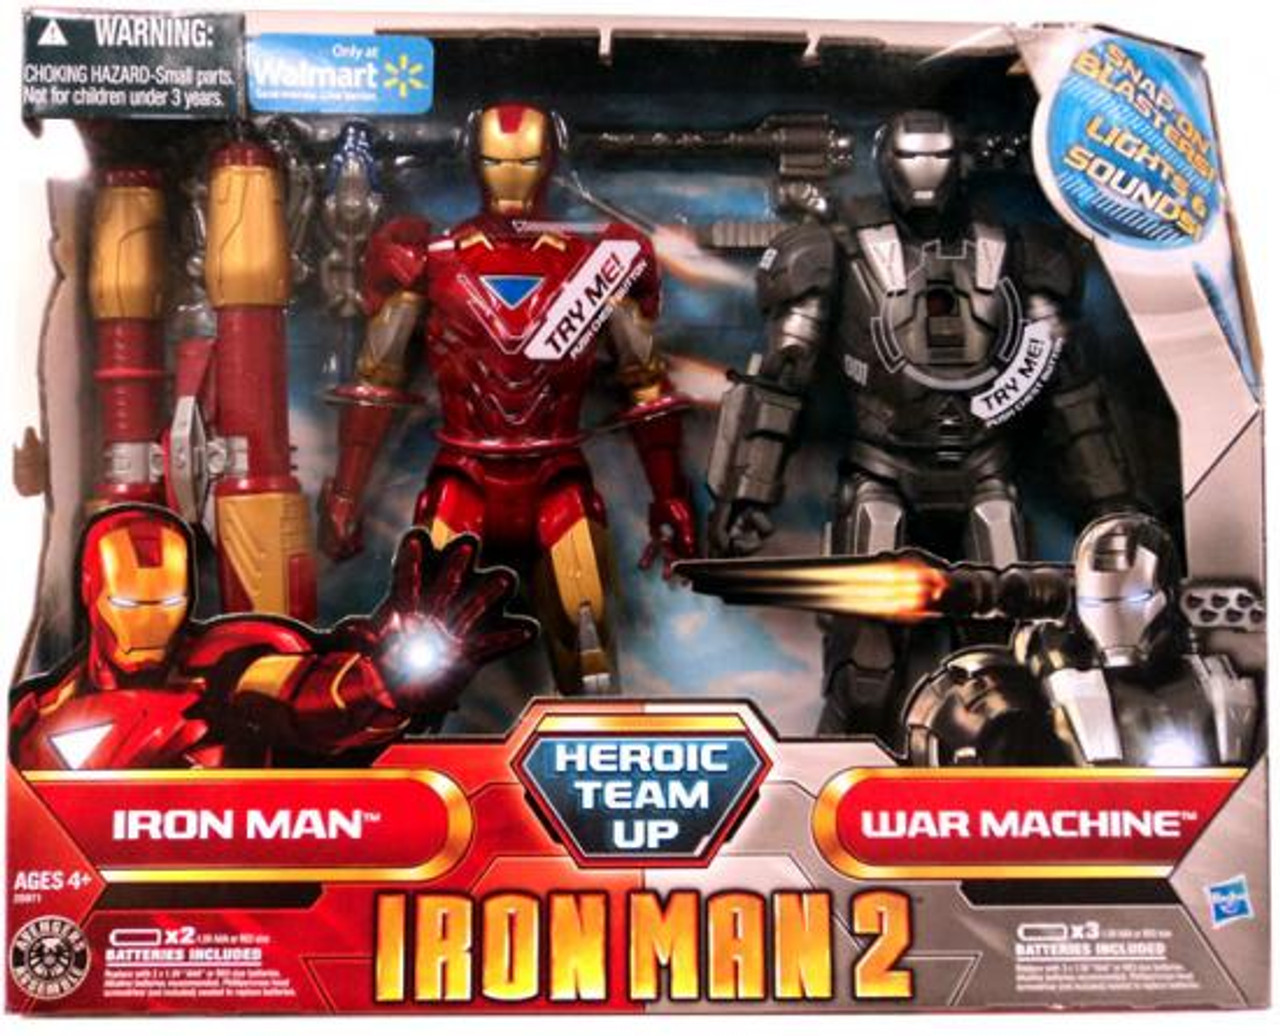 Iron Man 2 Heroic Team Up Exclusive Action Figure Set